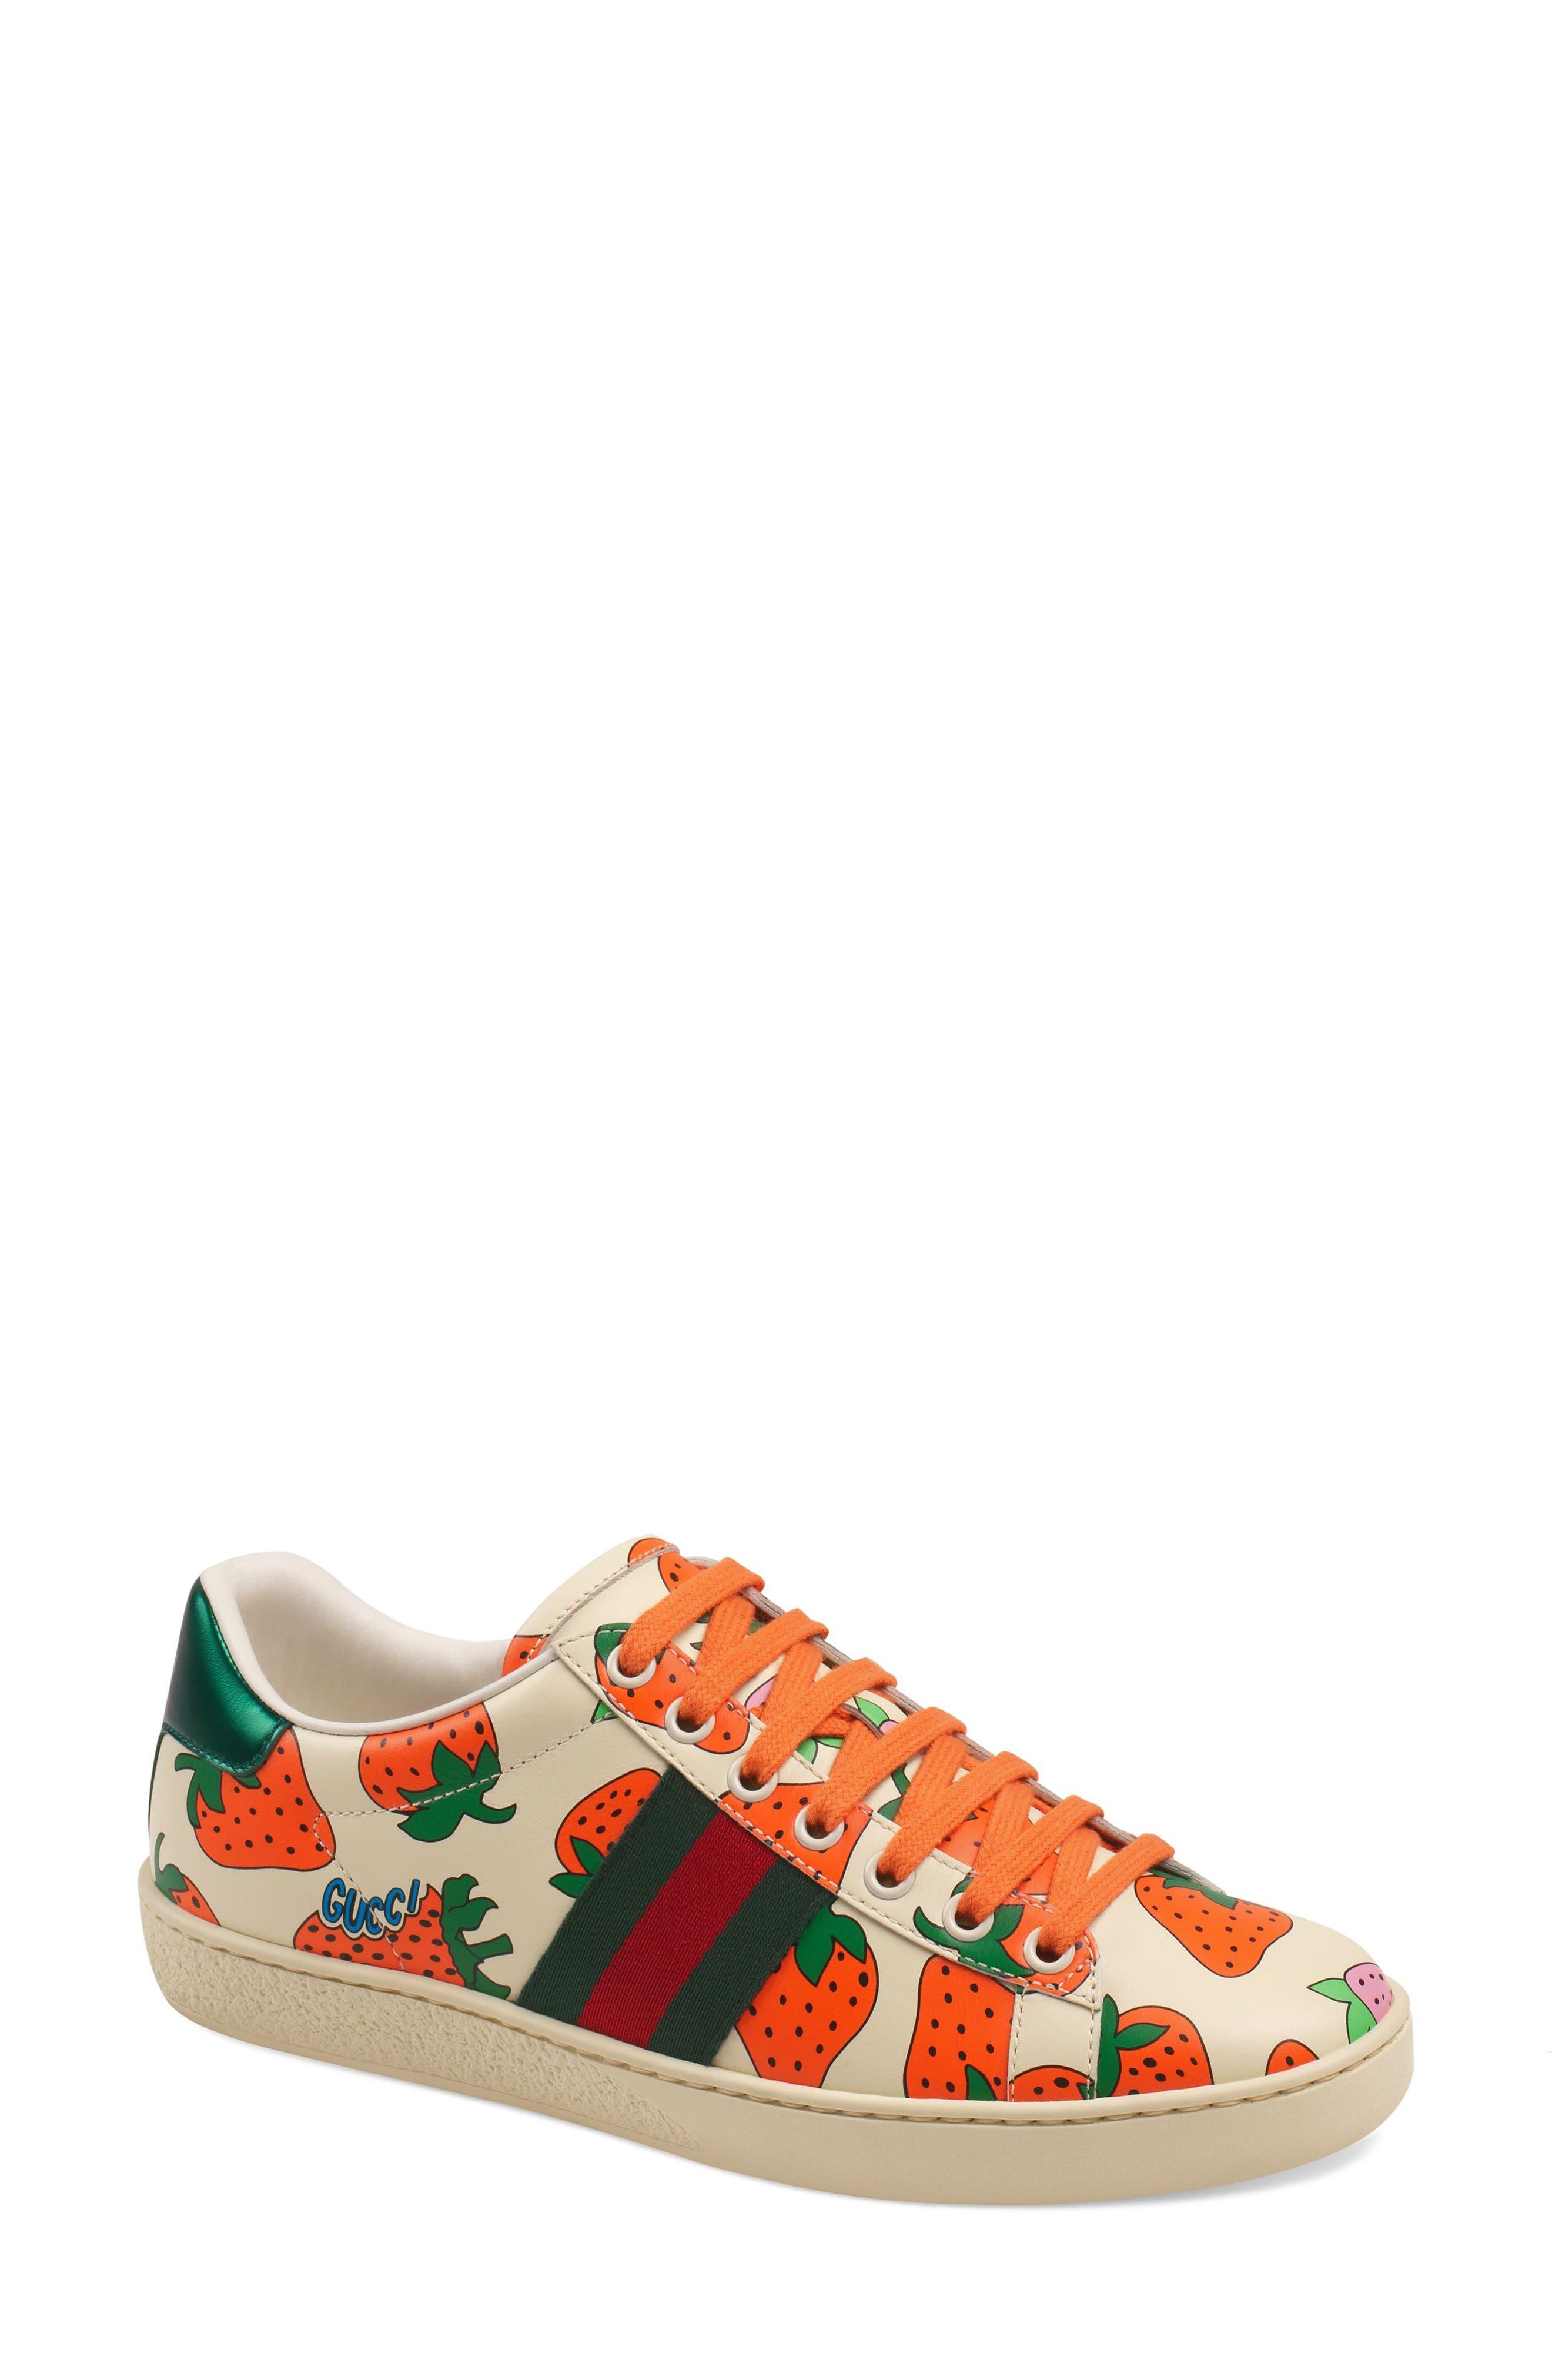 Gucci New Ace Strawberry Print Sneaker, White